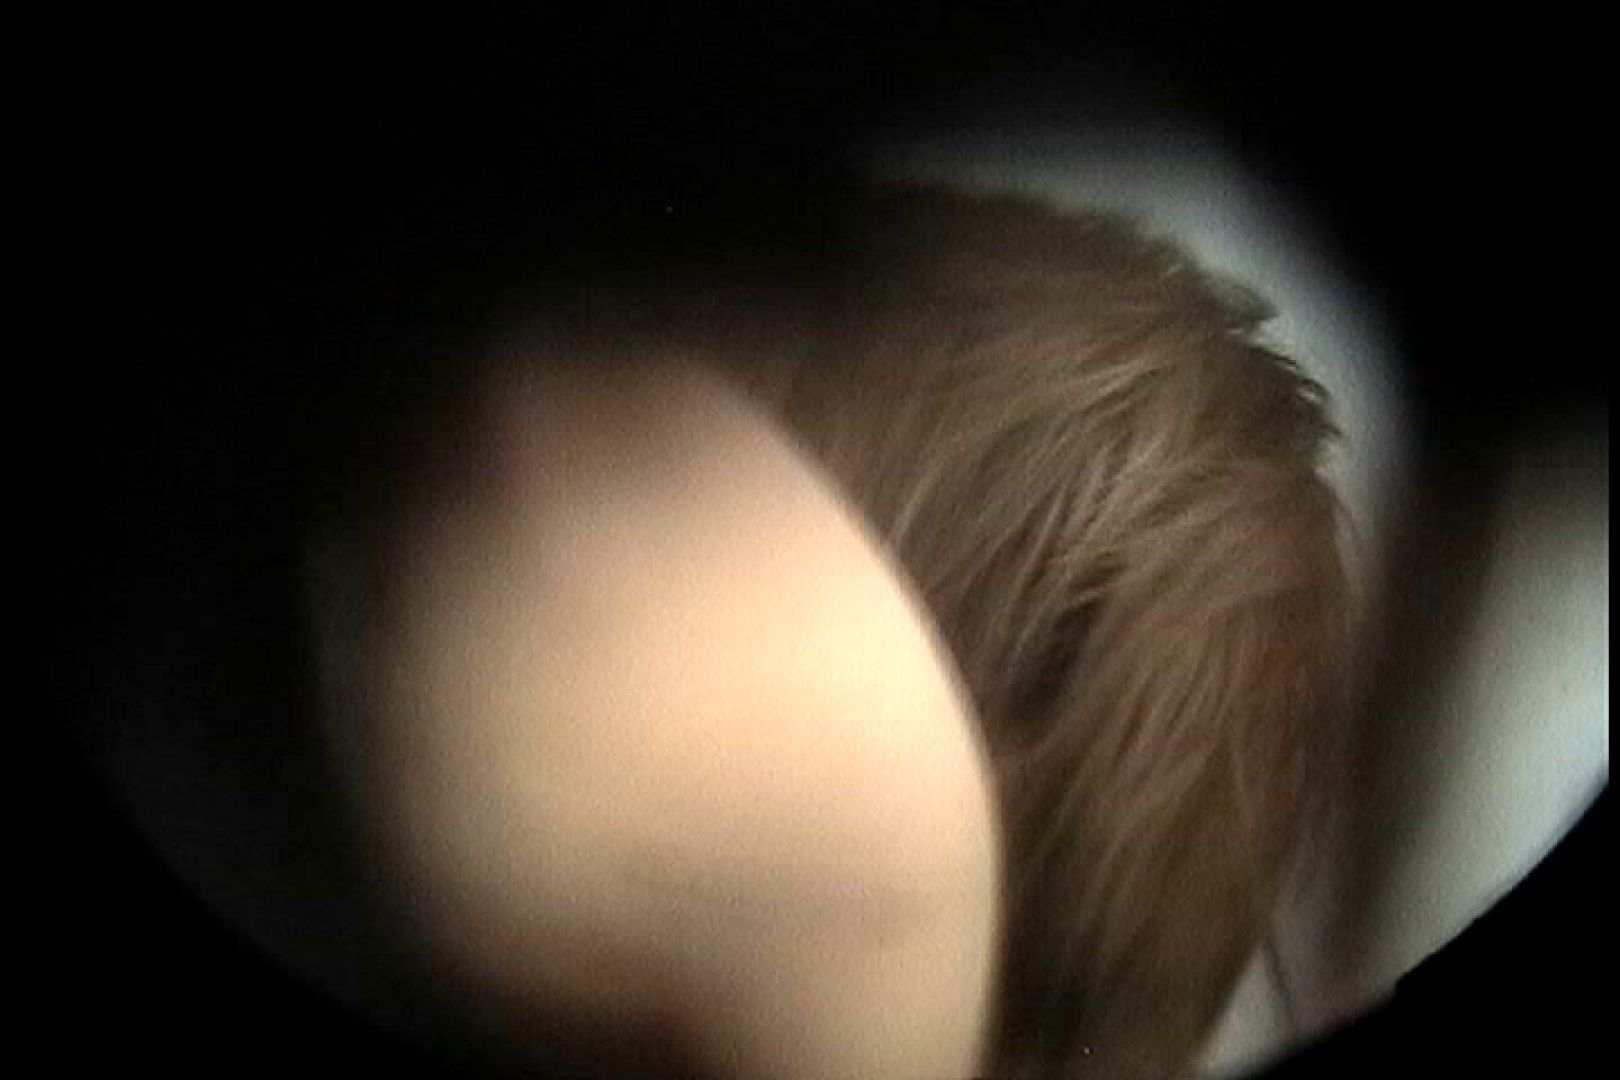 No.88 張りのある見事な巨乳のゆれ具合を堪能 日焼けした肌 すけべAV動画紹介 68画像 15